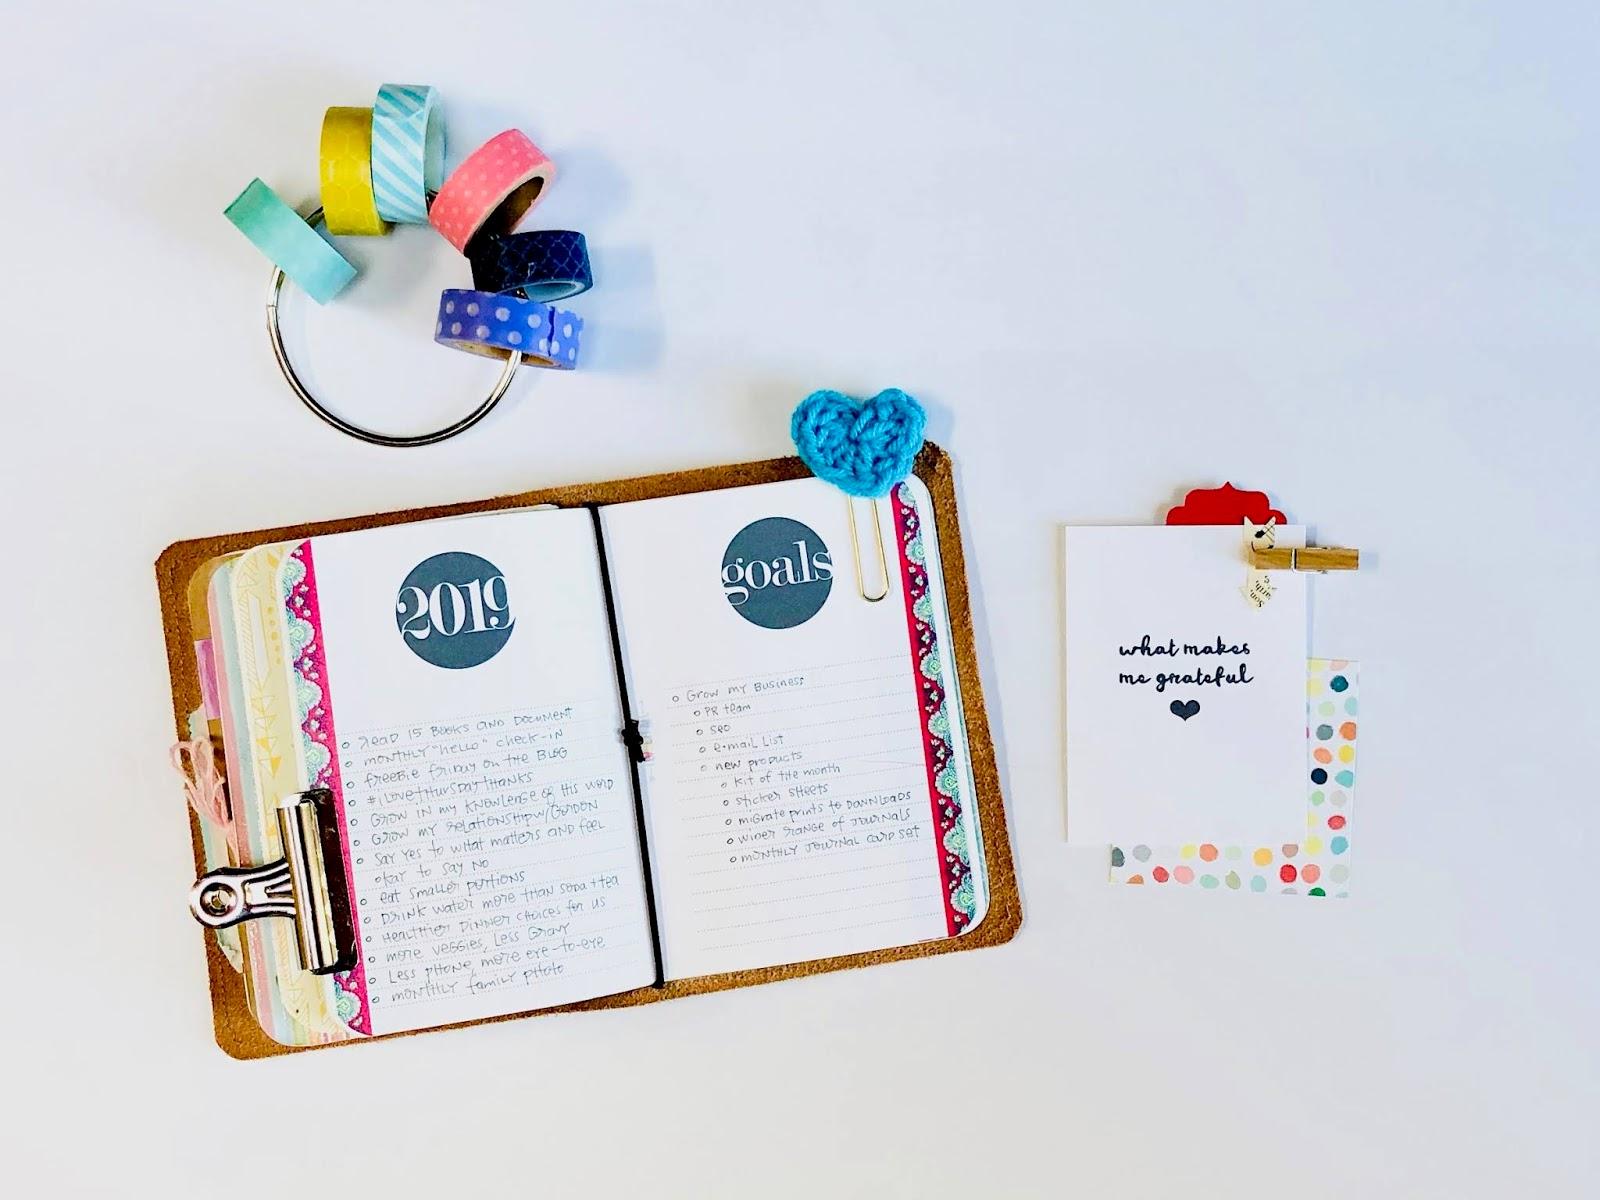 #travelers notebook #goals #goals worksheet #free #printable #download #2019 #midori #A6 #passport #field notes #micro